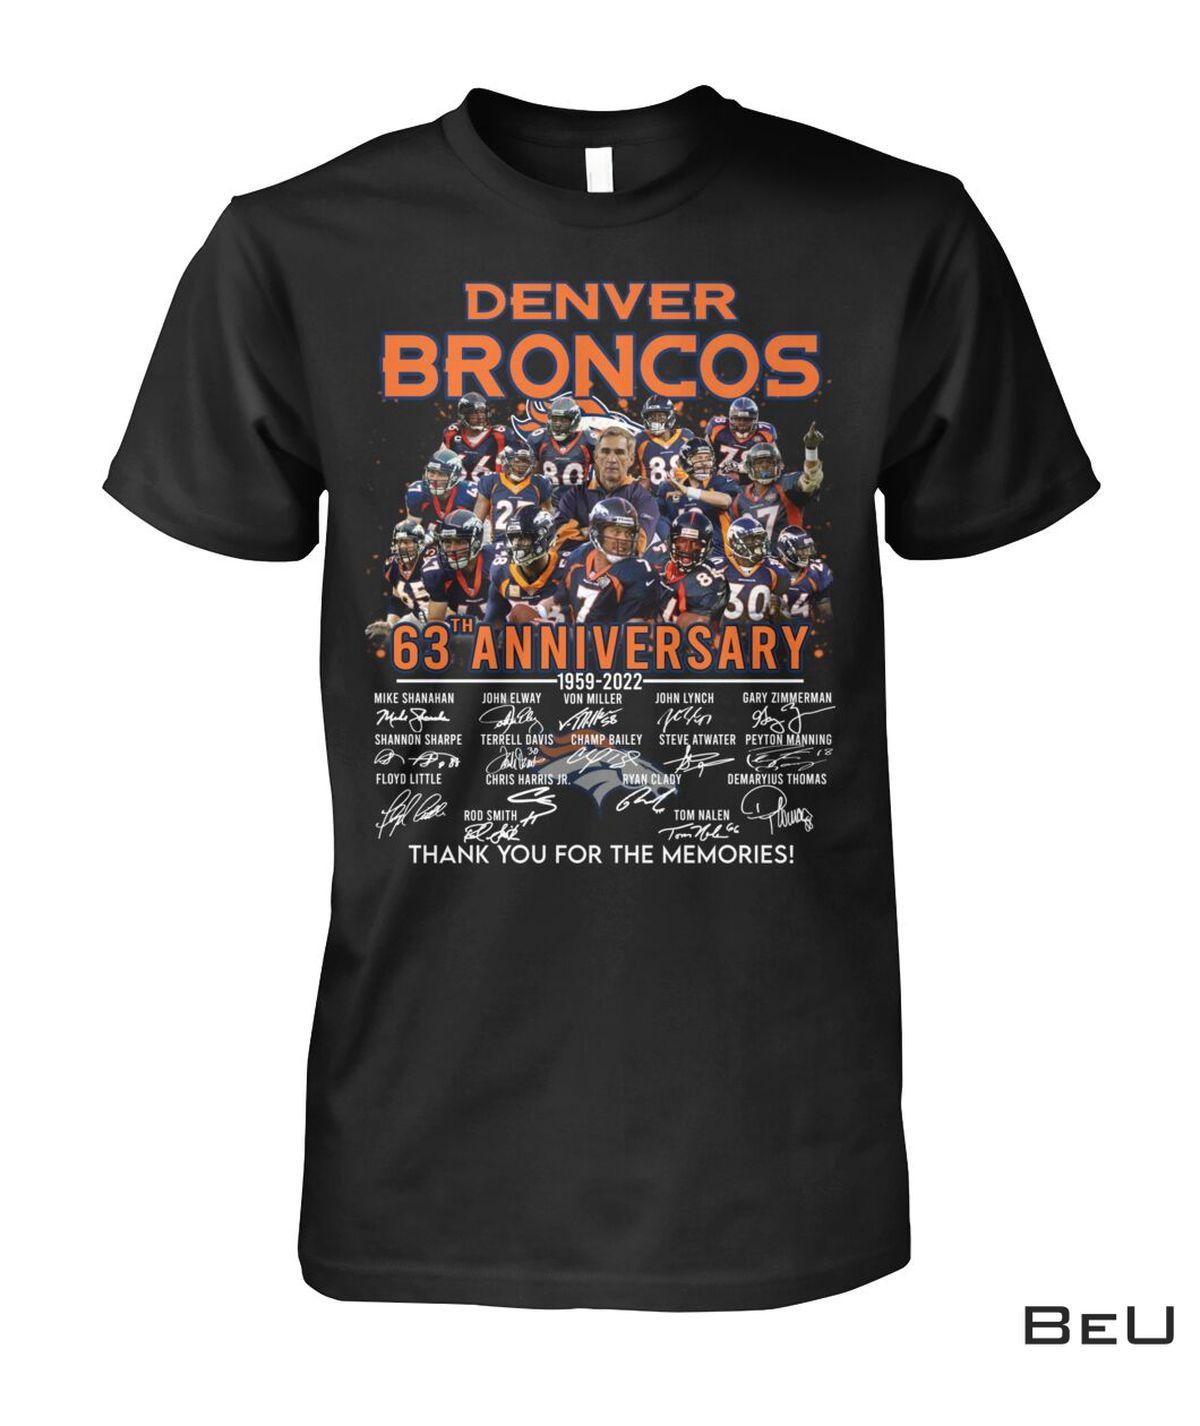 Denver Broncos 63 Years Anniversary Shirt, hoodie, tank top